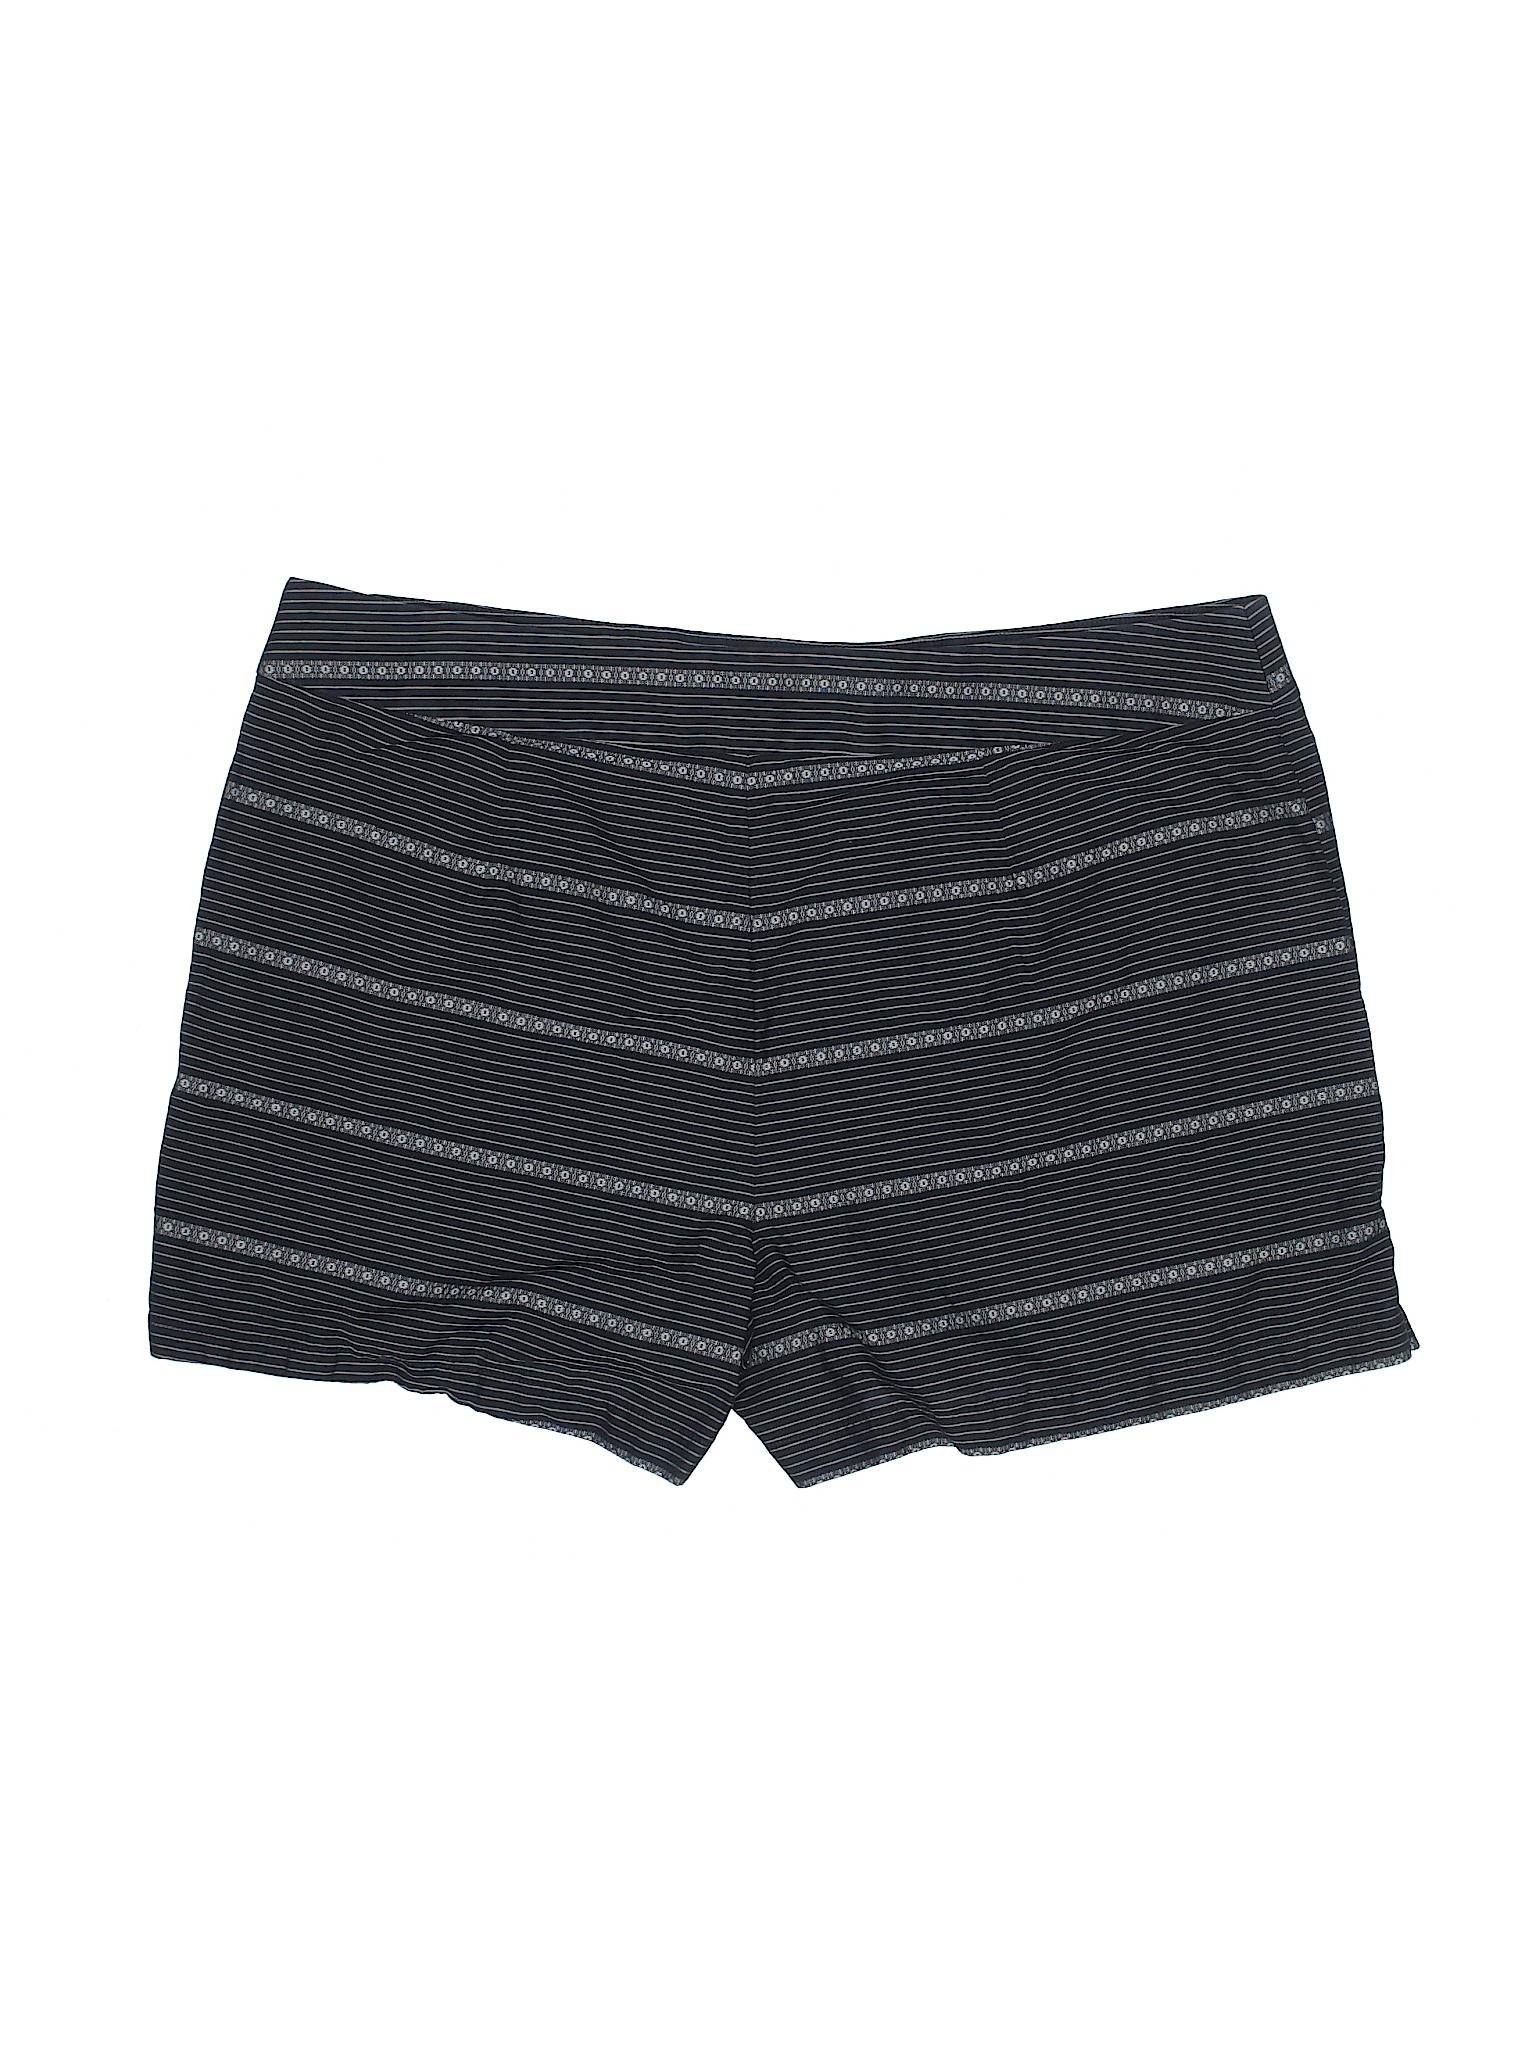 Taylor leisure LOFT Shorts Boutique Ann nOgxqn8